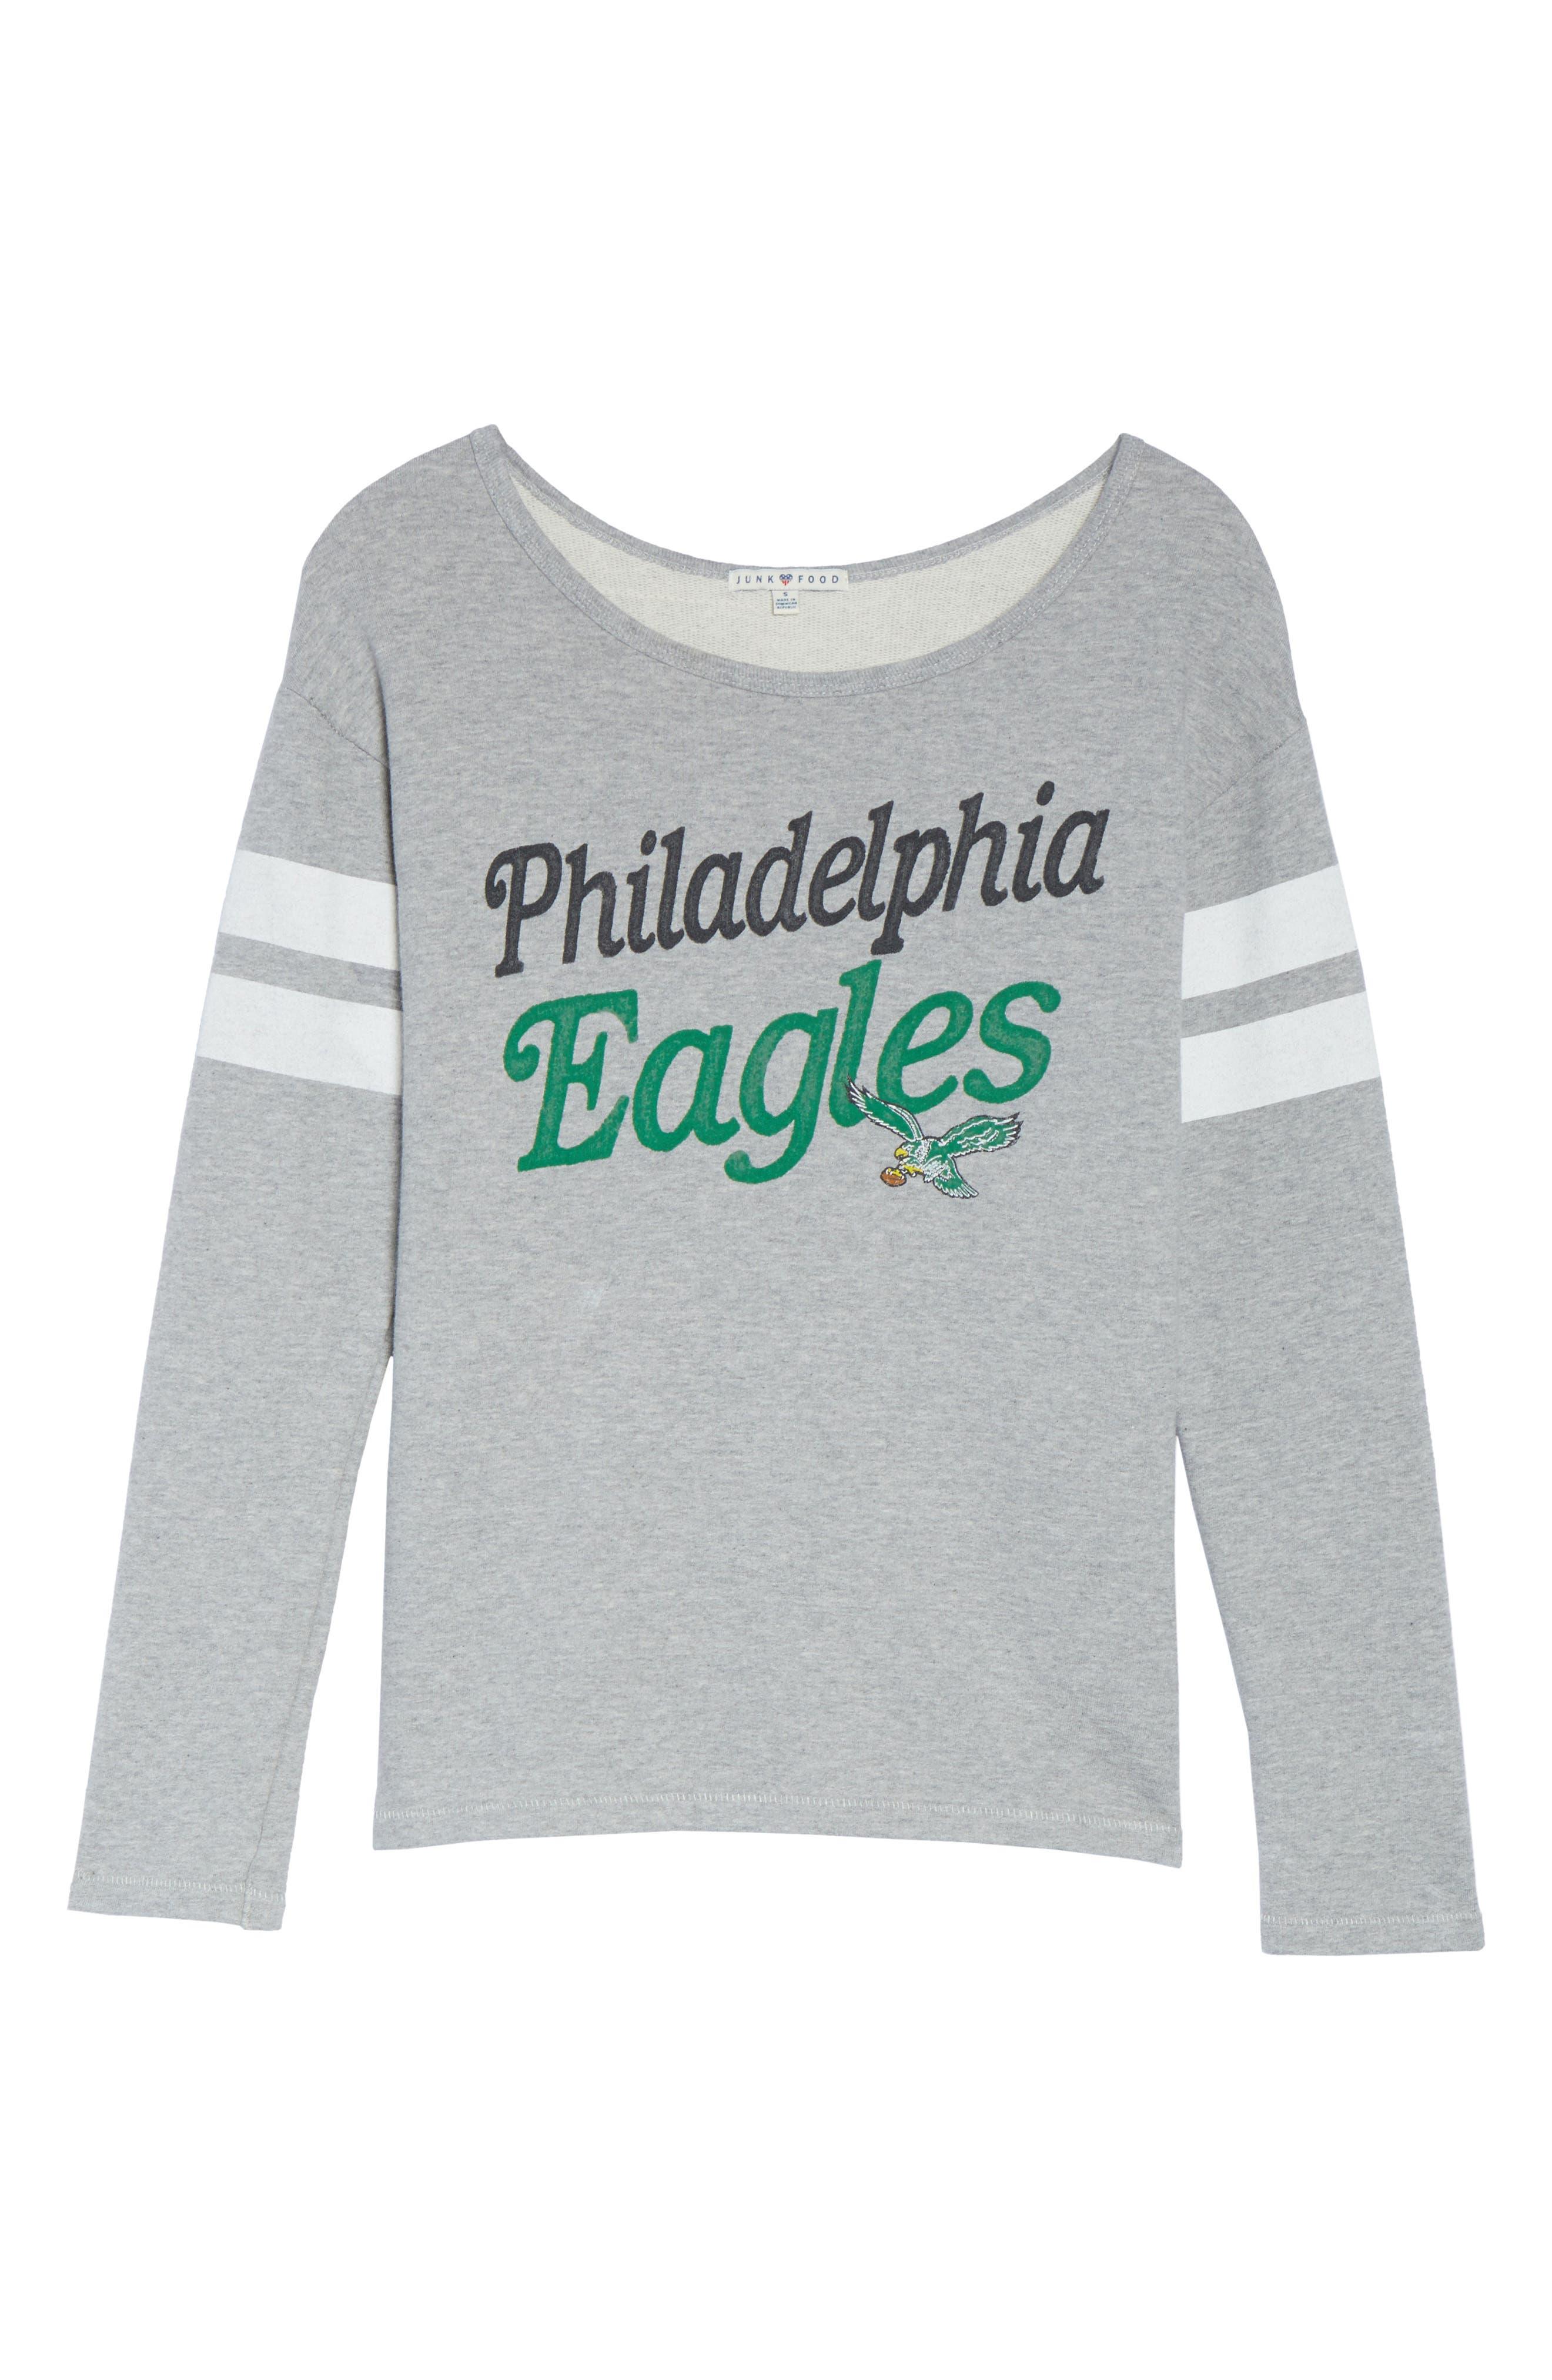 NFL Philadelphia Eagles Champion Sweatshirt,                             Alternate thumbnail 6, color,                             028